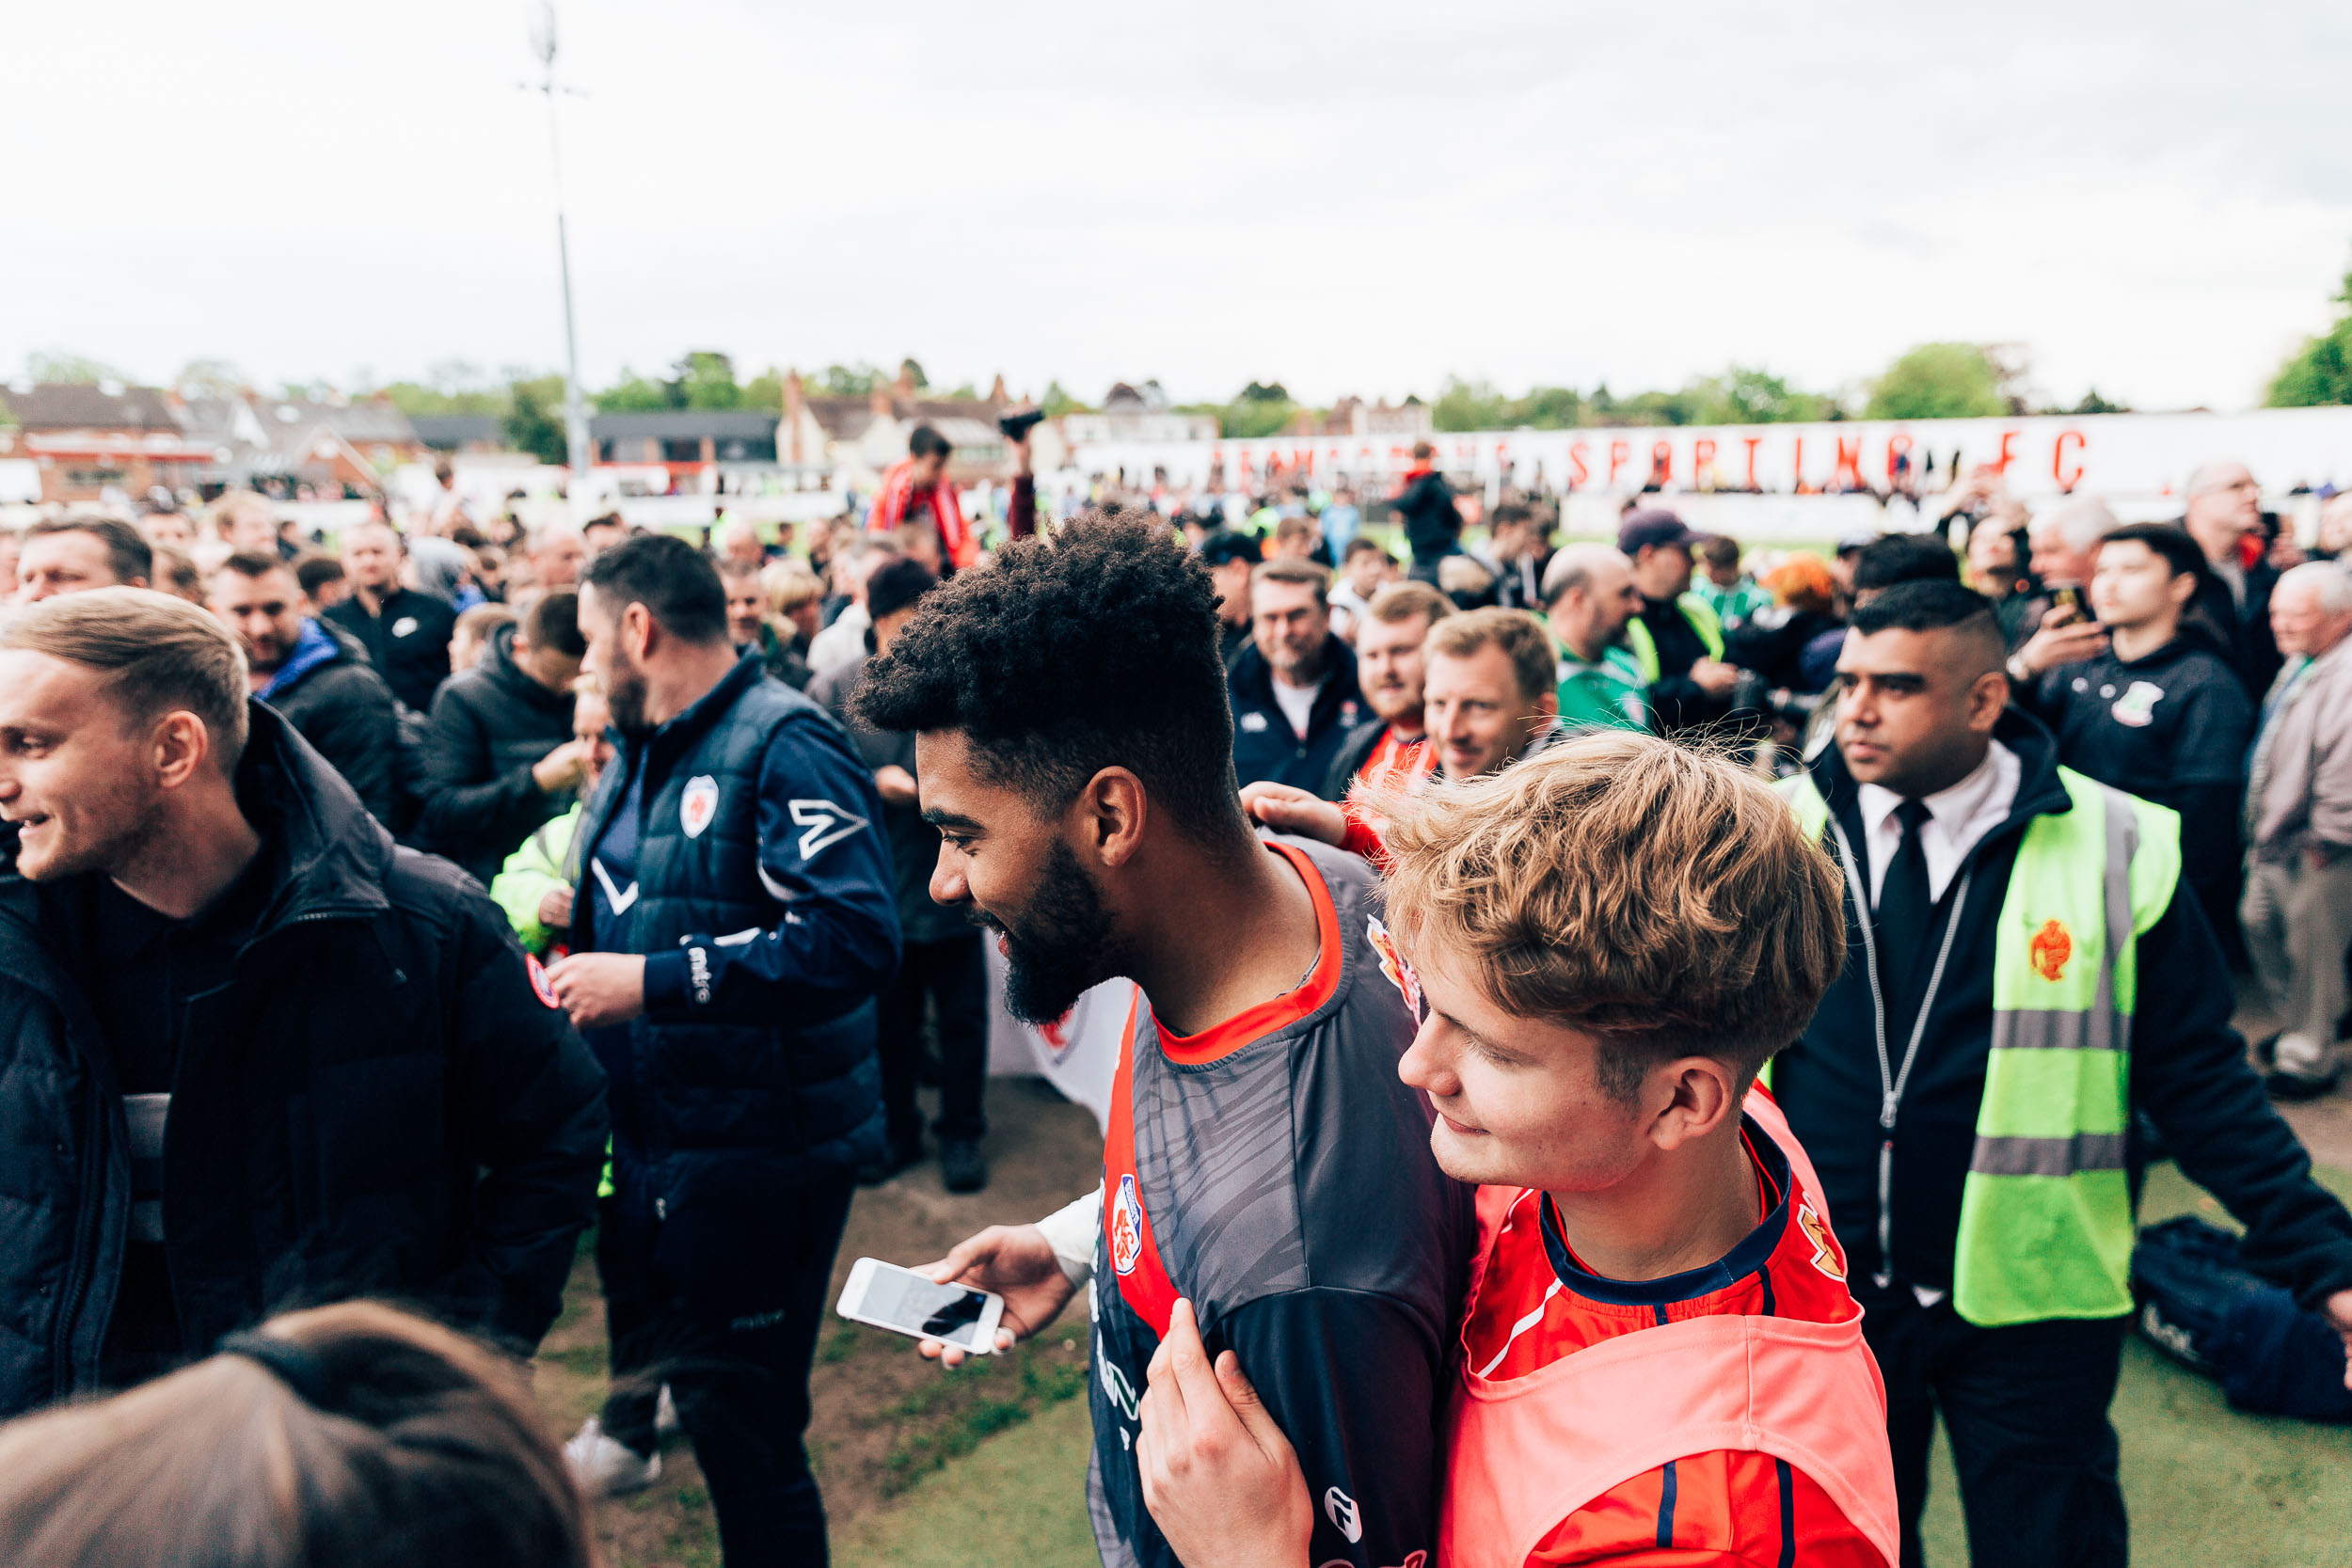 06_05_2019_Bromsgrove_Sporting_Corby-203.jpg